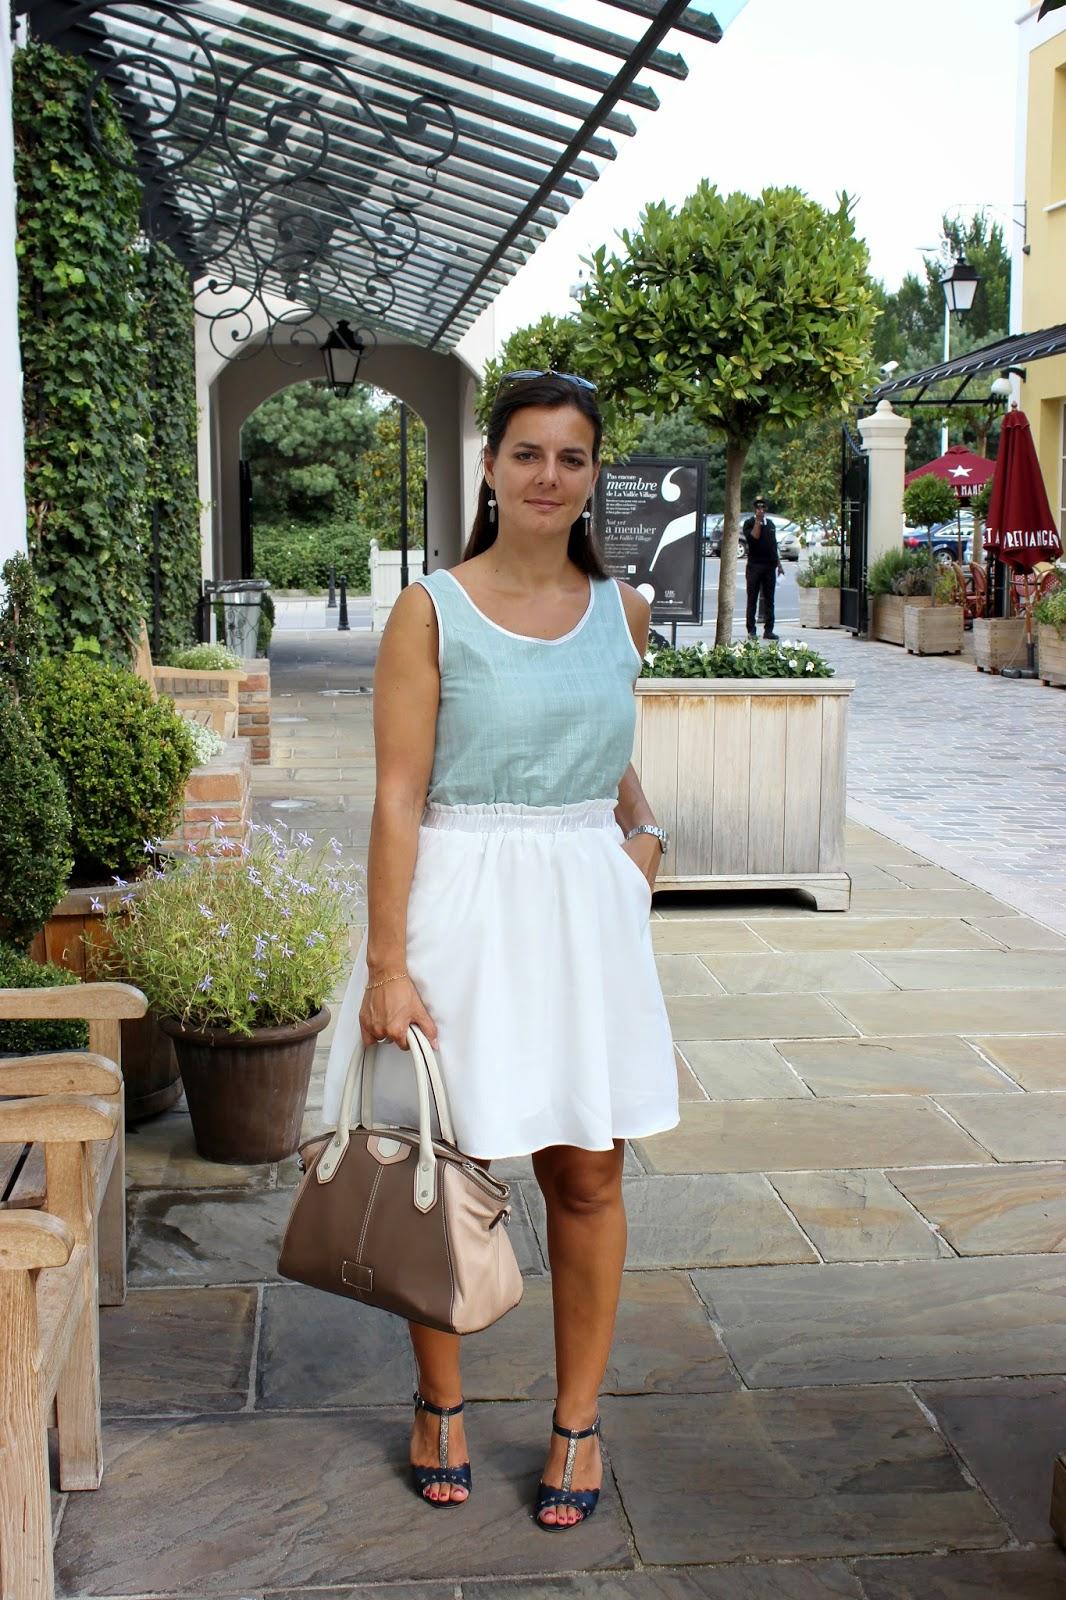 la vallée village, robe suncoo, sac clarks, chaussures kookai bleues